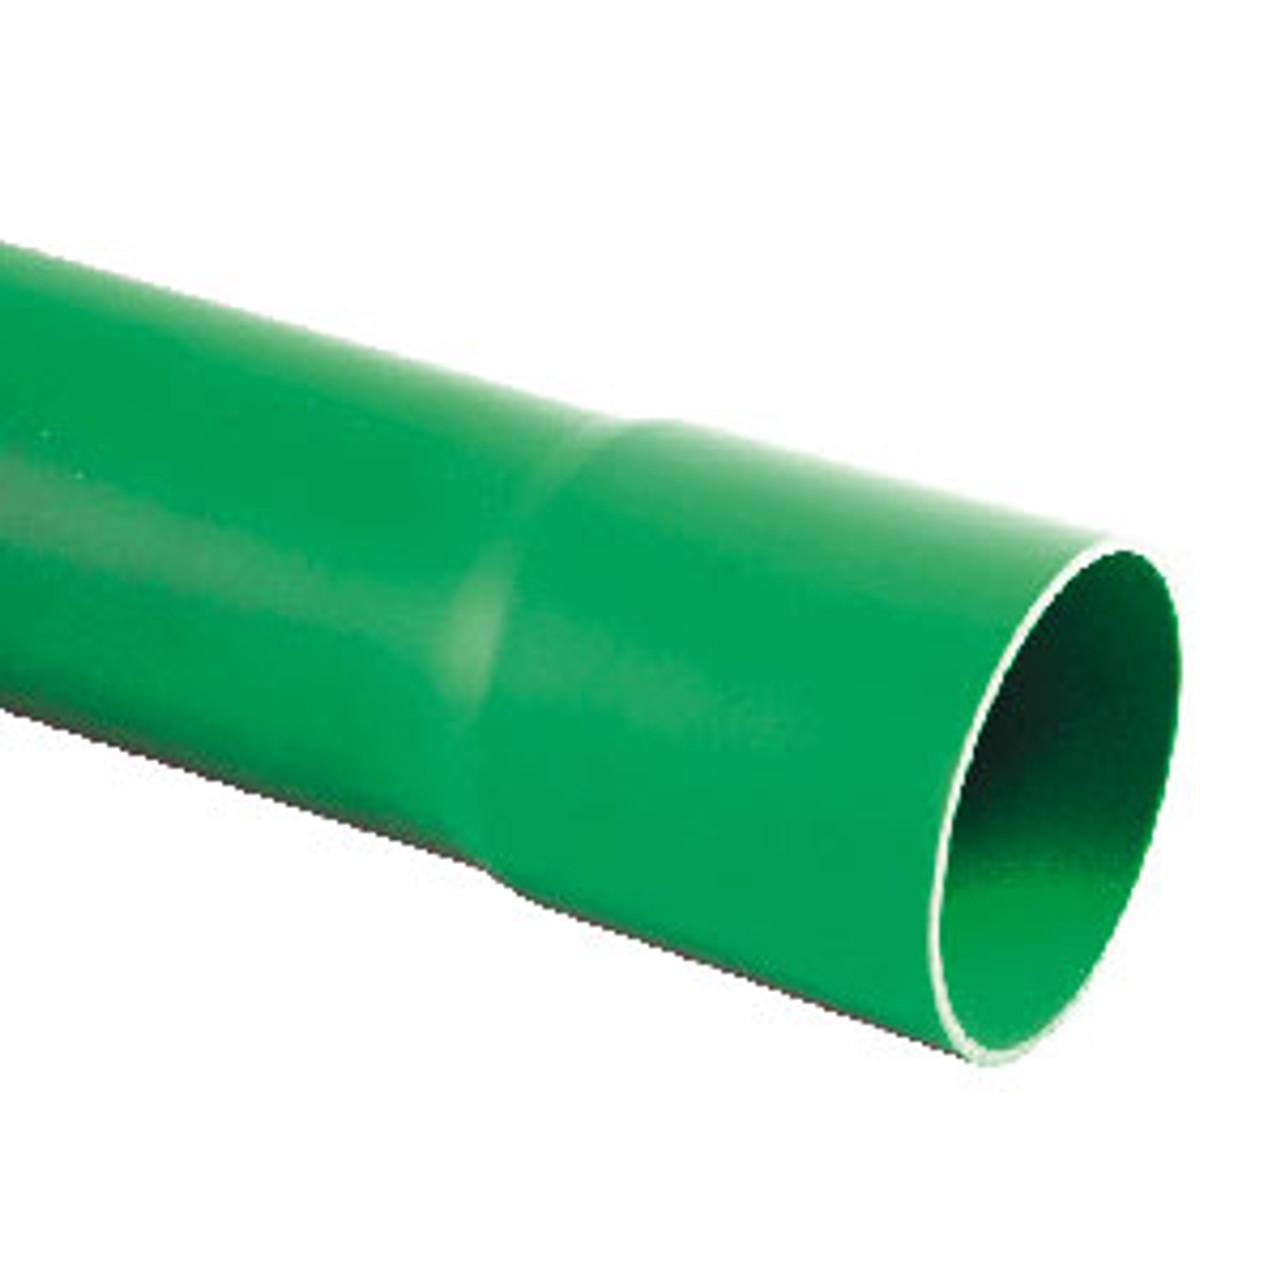 Green solid wall PVC-U 90/96.5mm ducting (6m).